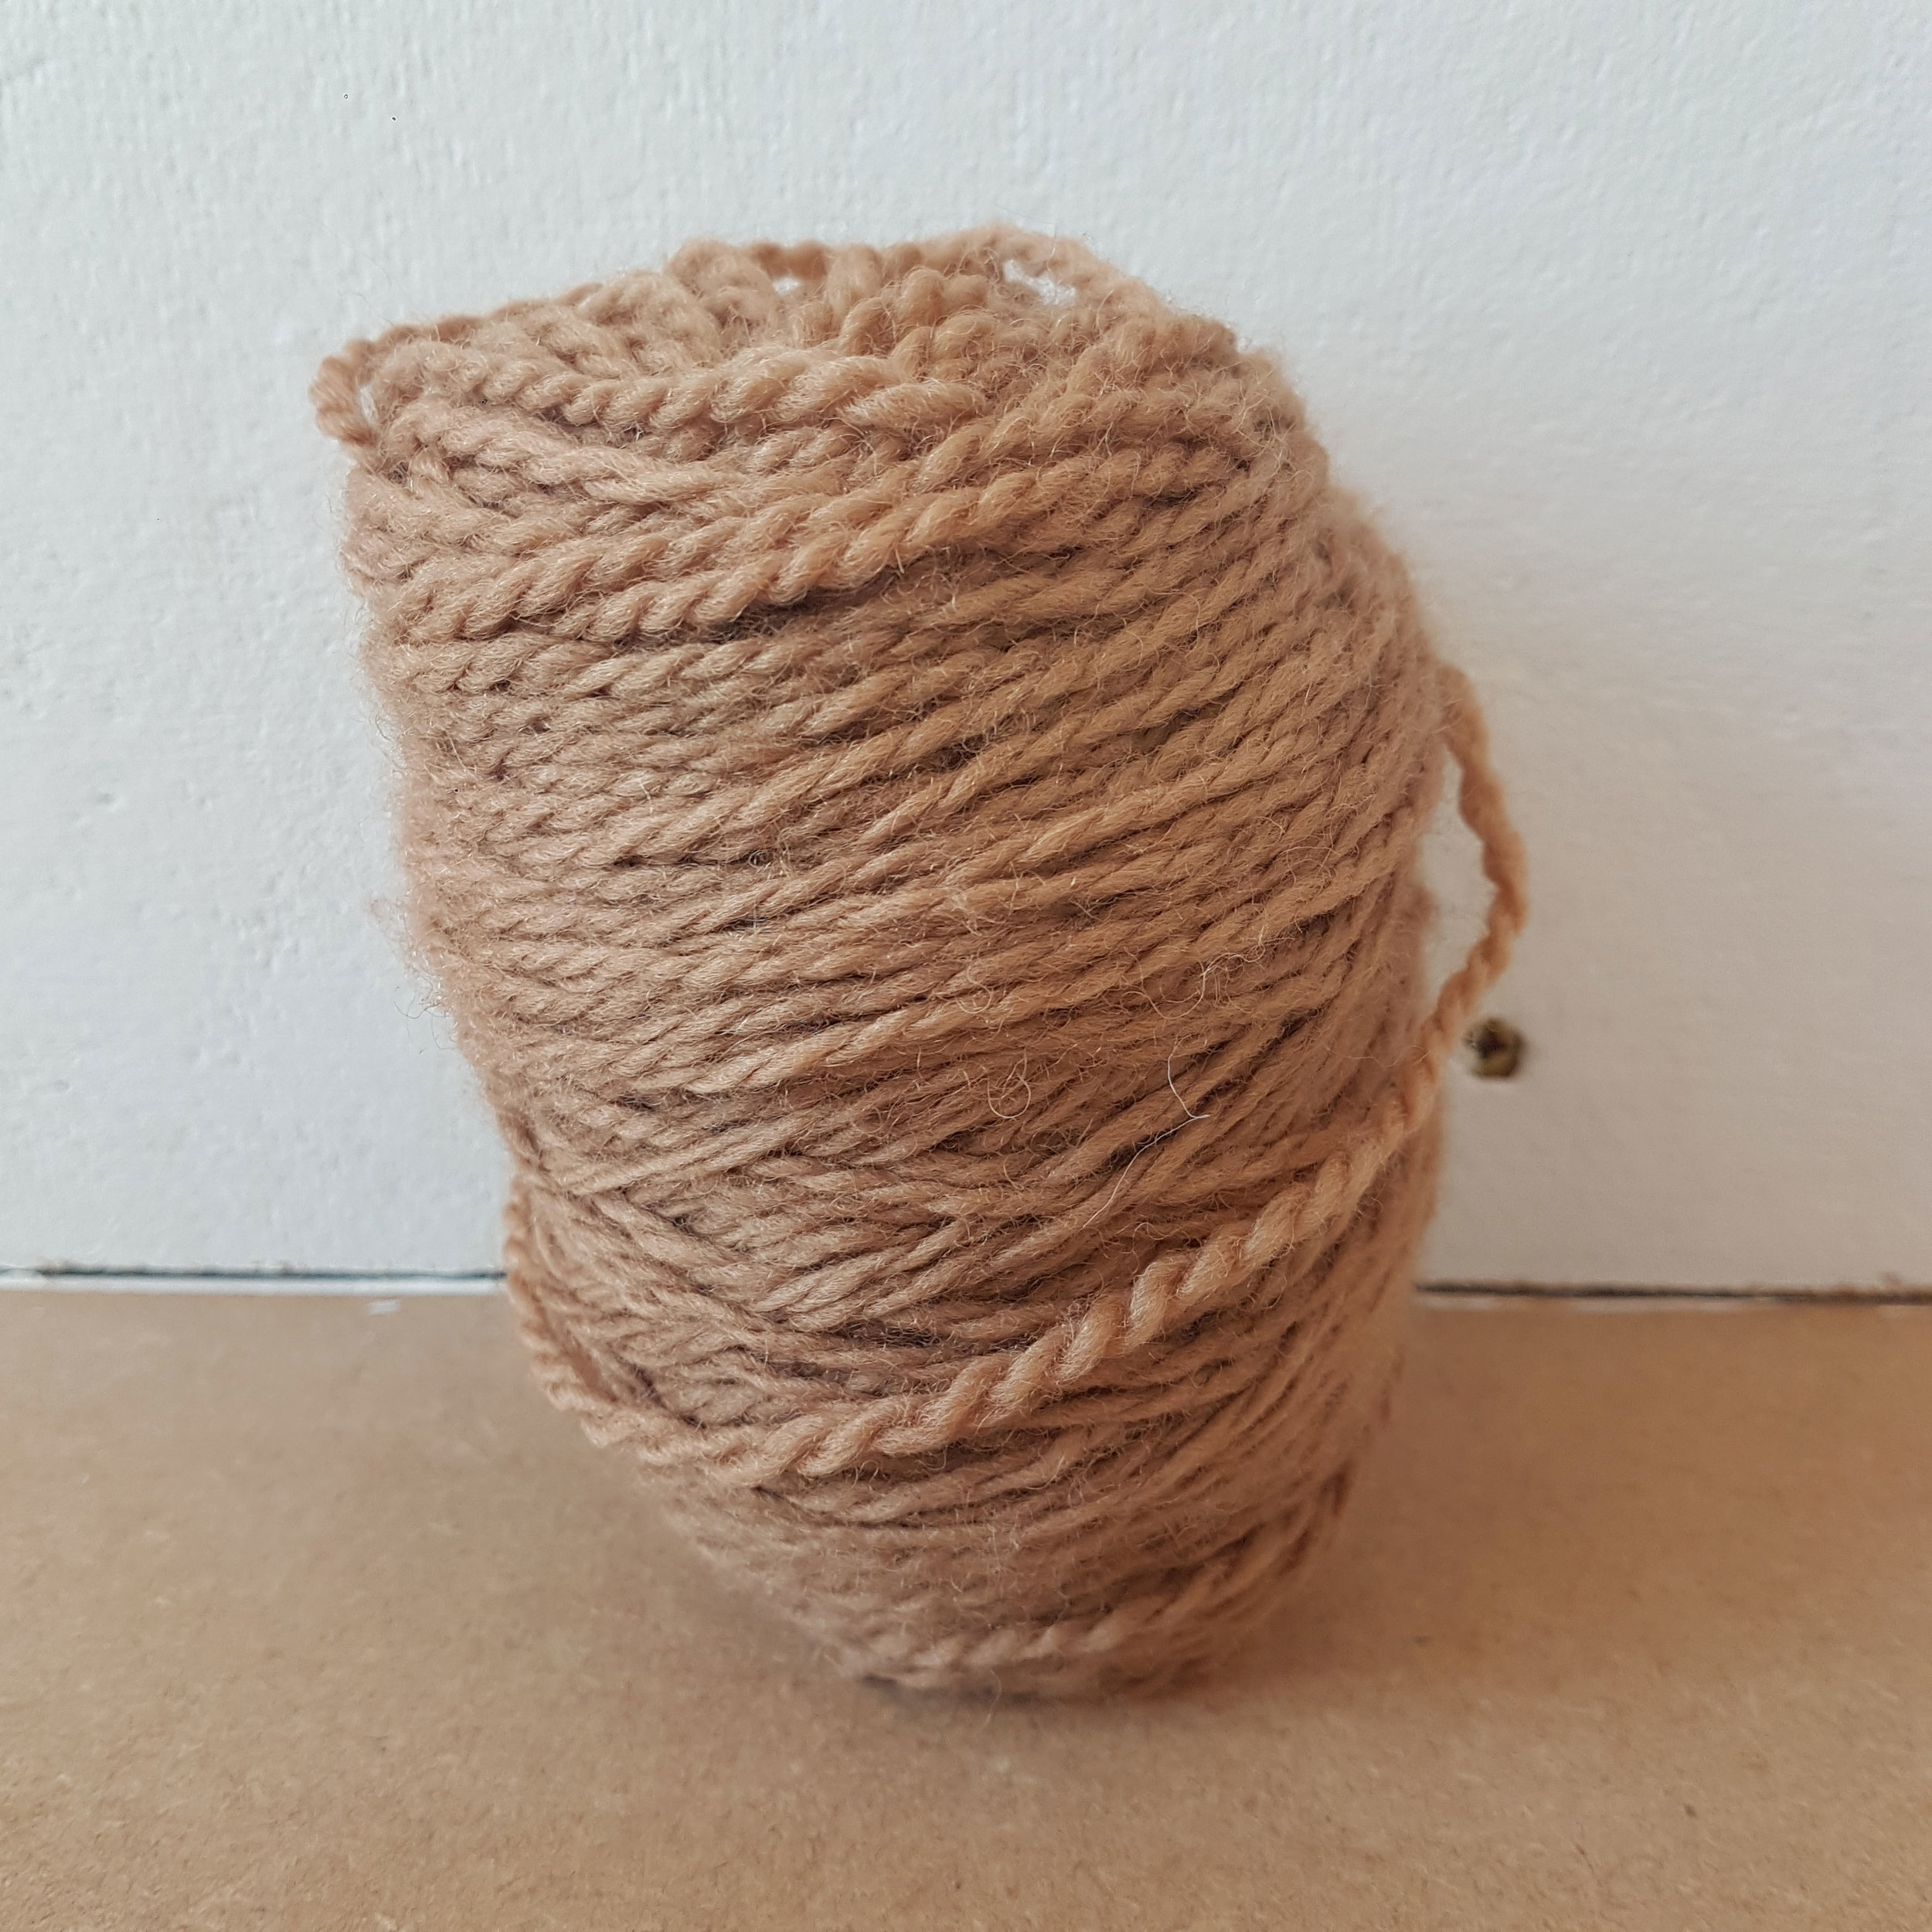 Burns, R. (2017) Walnut Dye 2. (Own Collection)